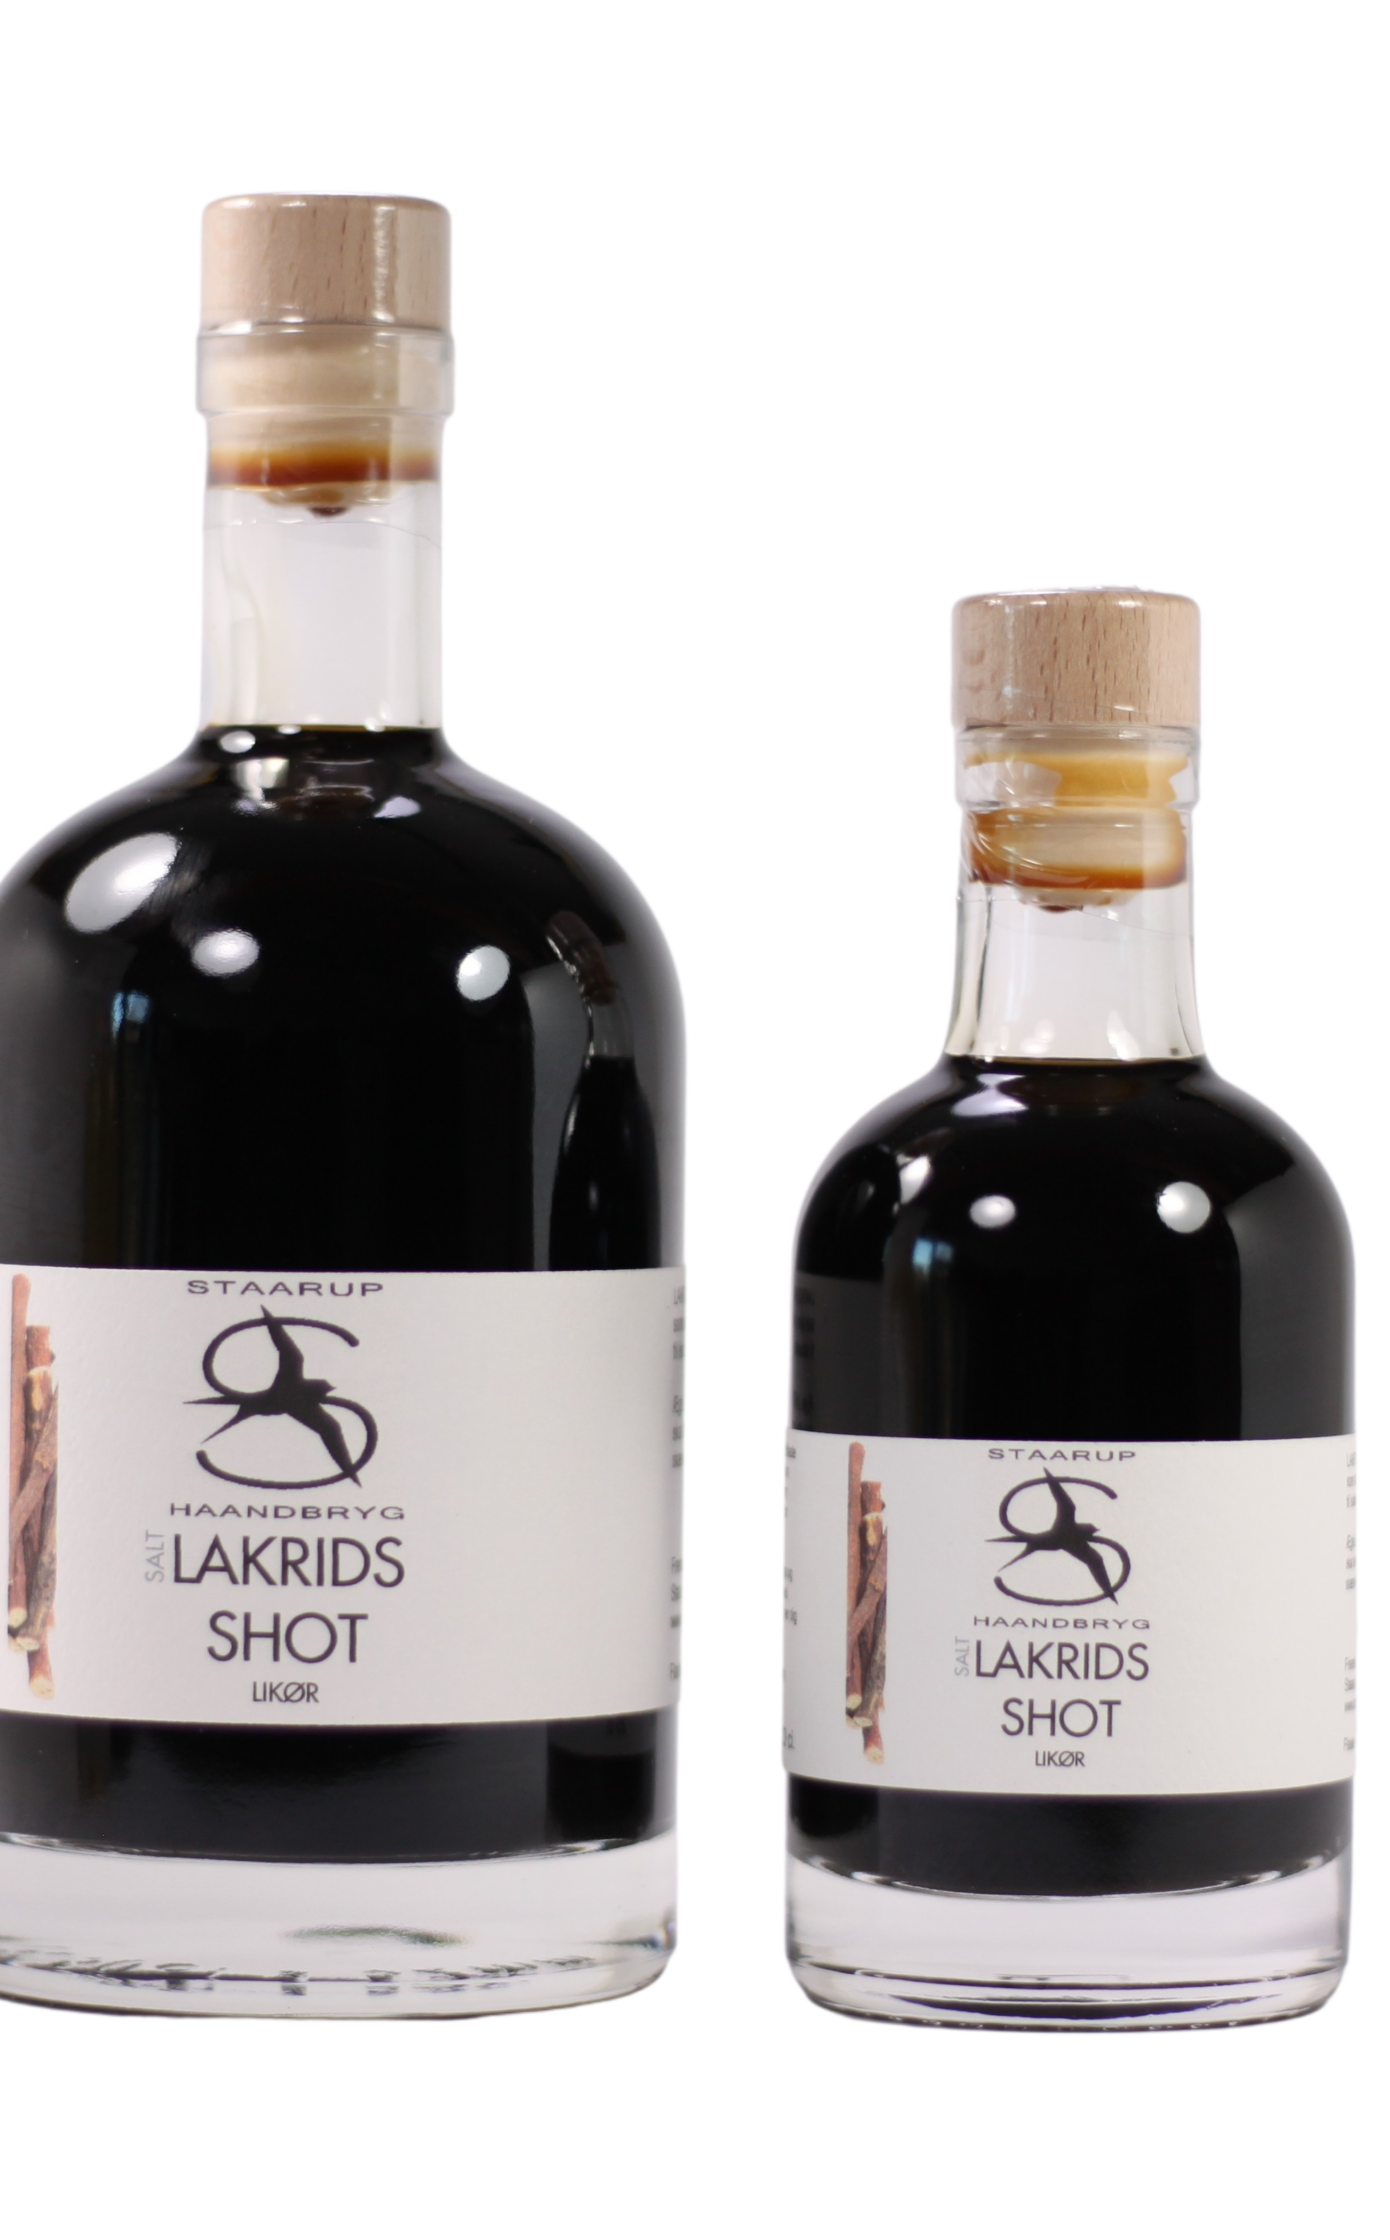 LakridsSHOT